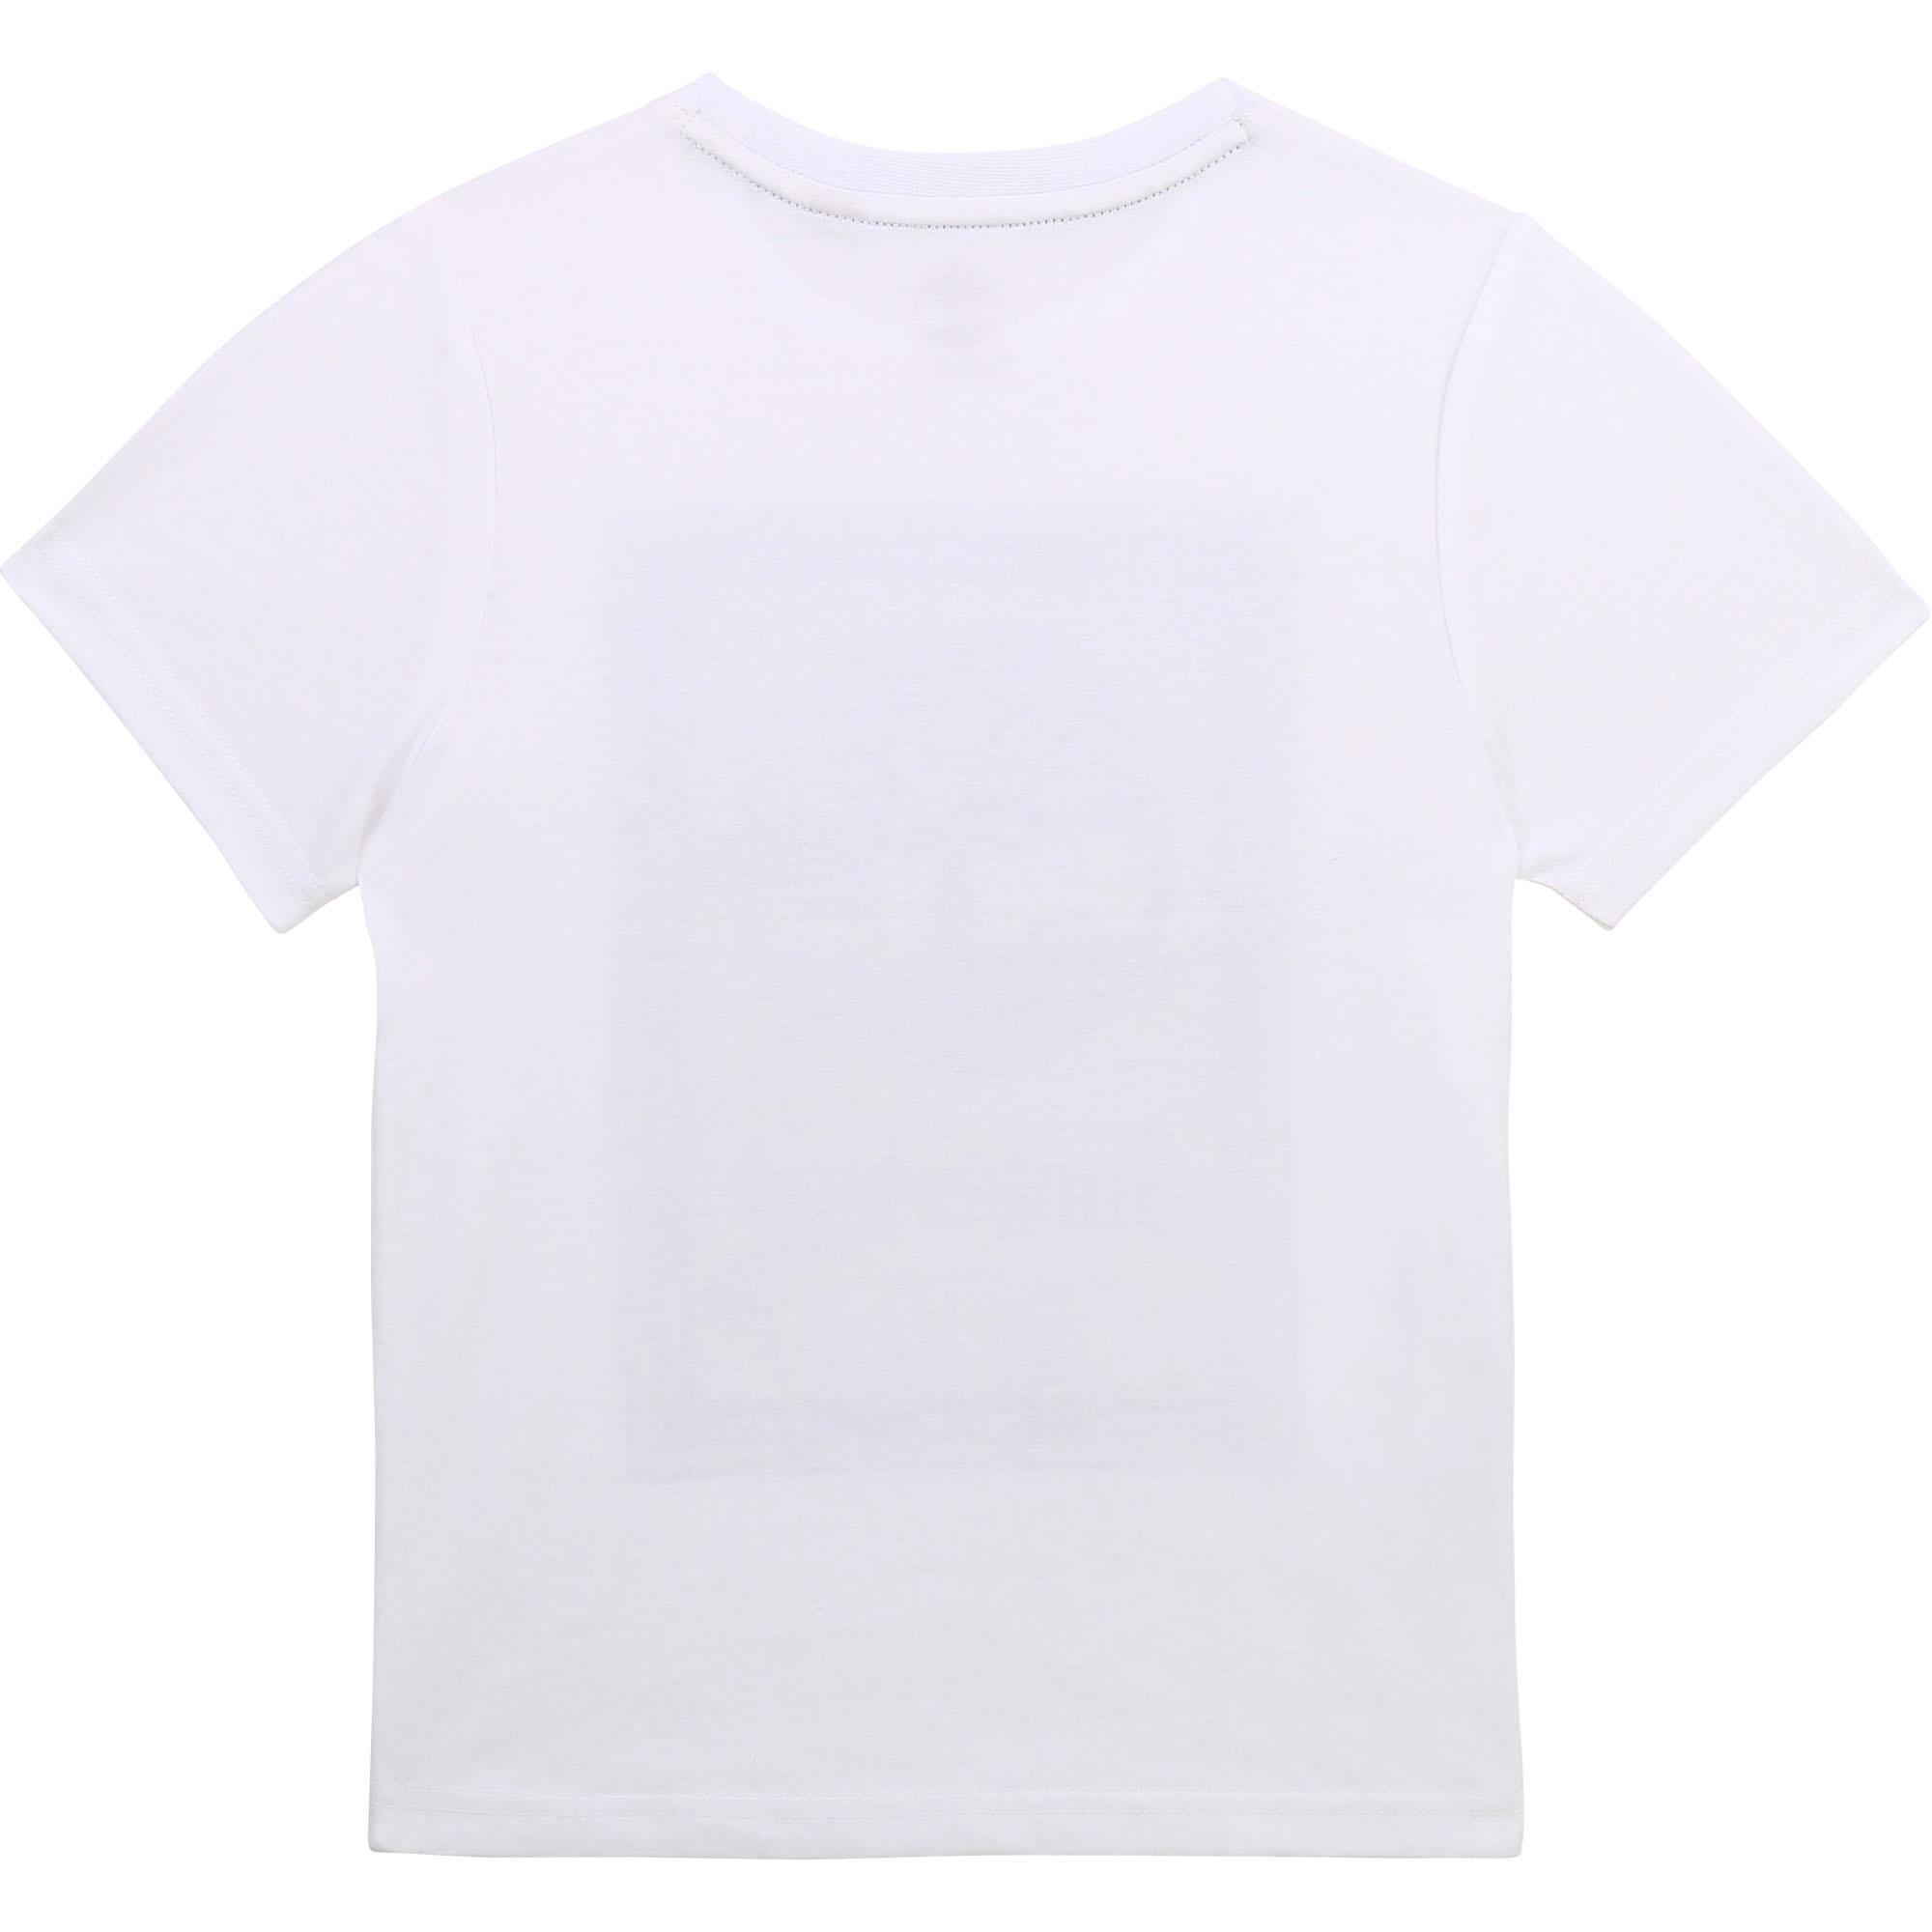 TIMBERLAND t-shirt-3